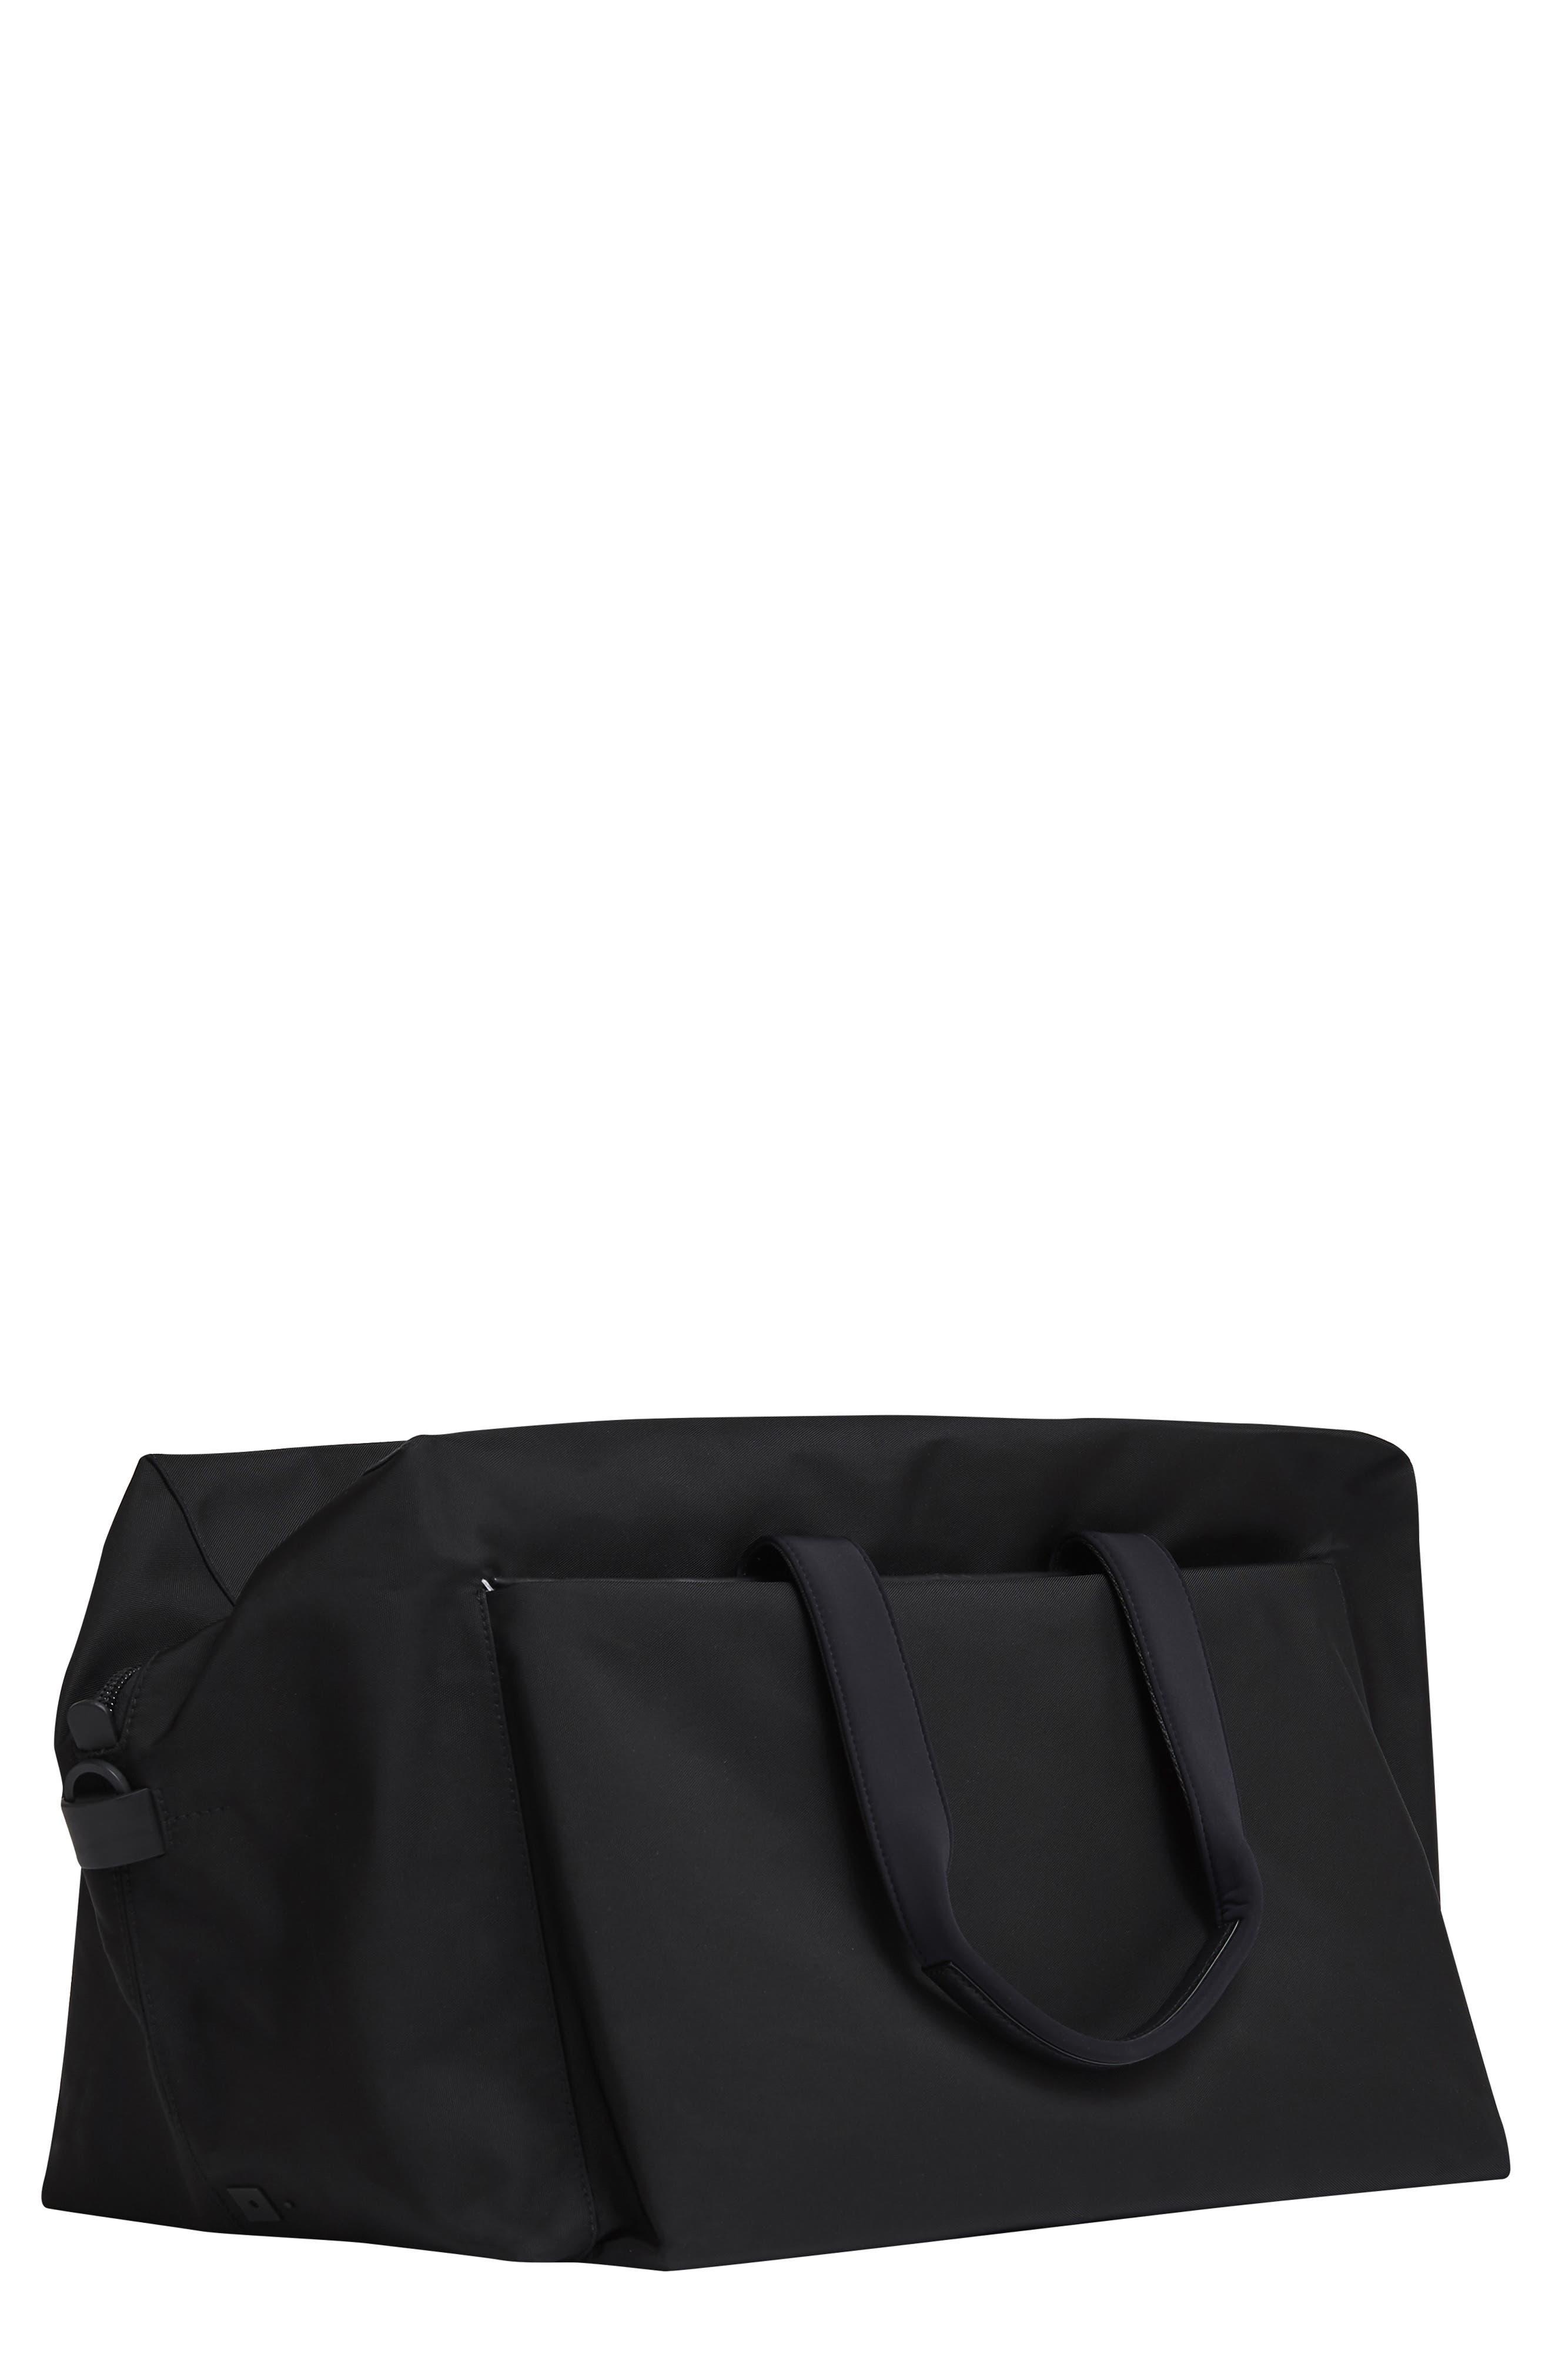 Lightweight Duffel Bag,                         Main,                         color, Black Nylon/ Black Leather